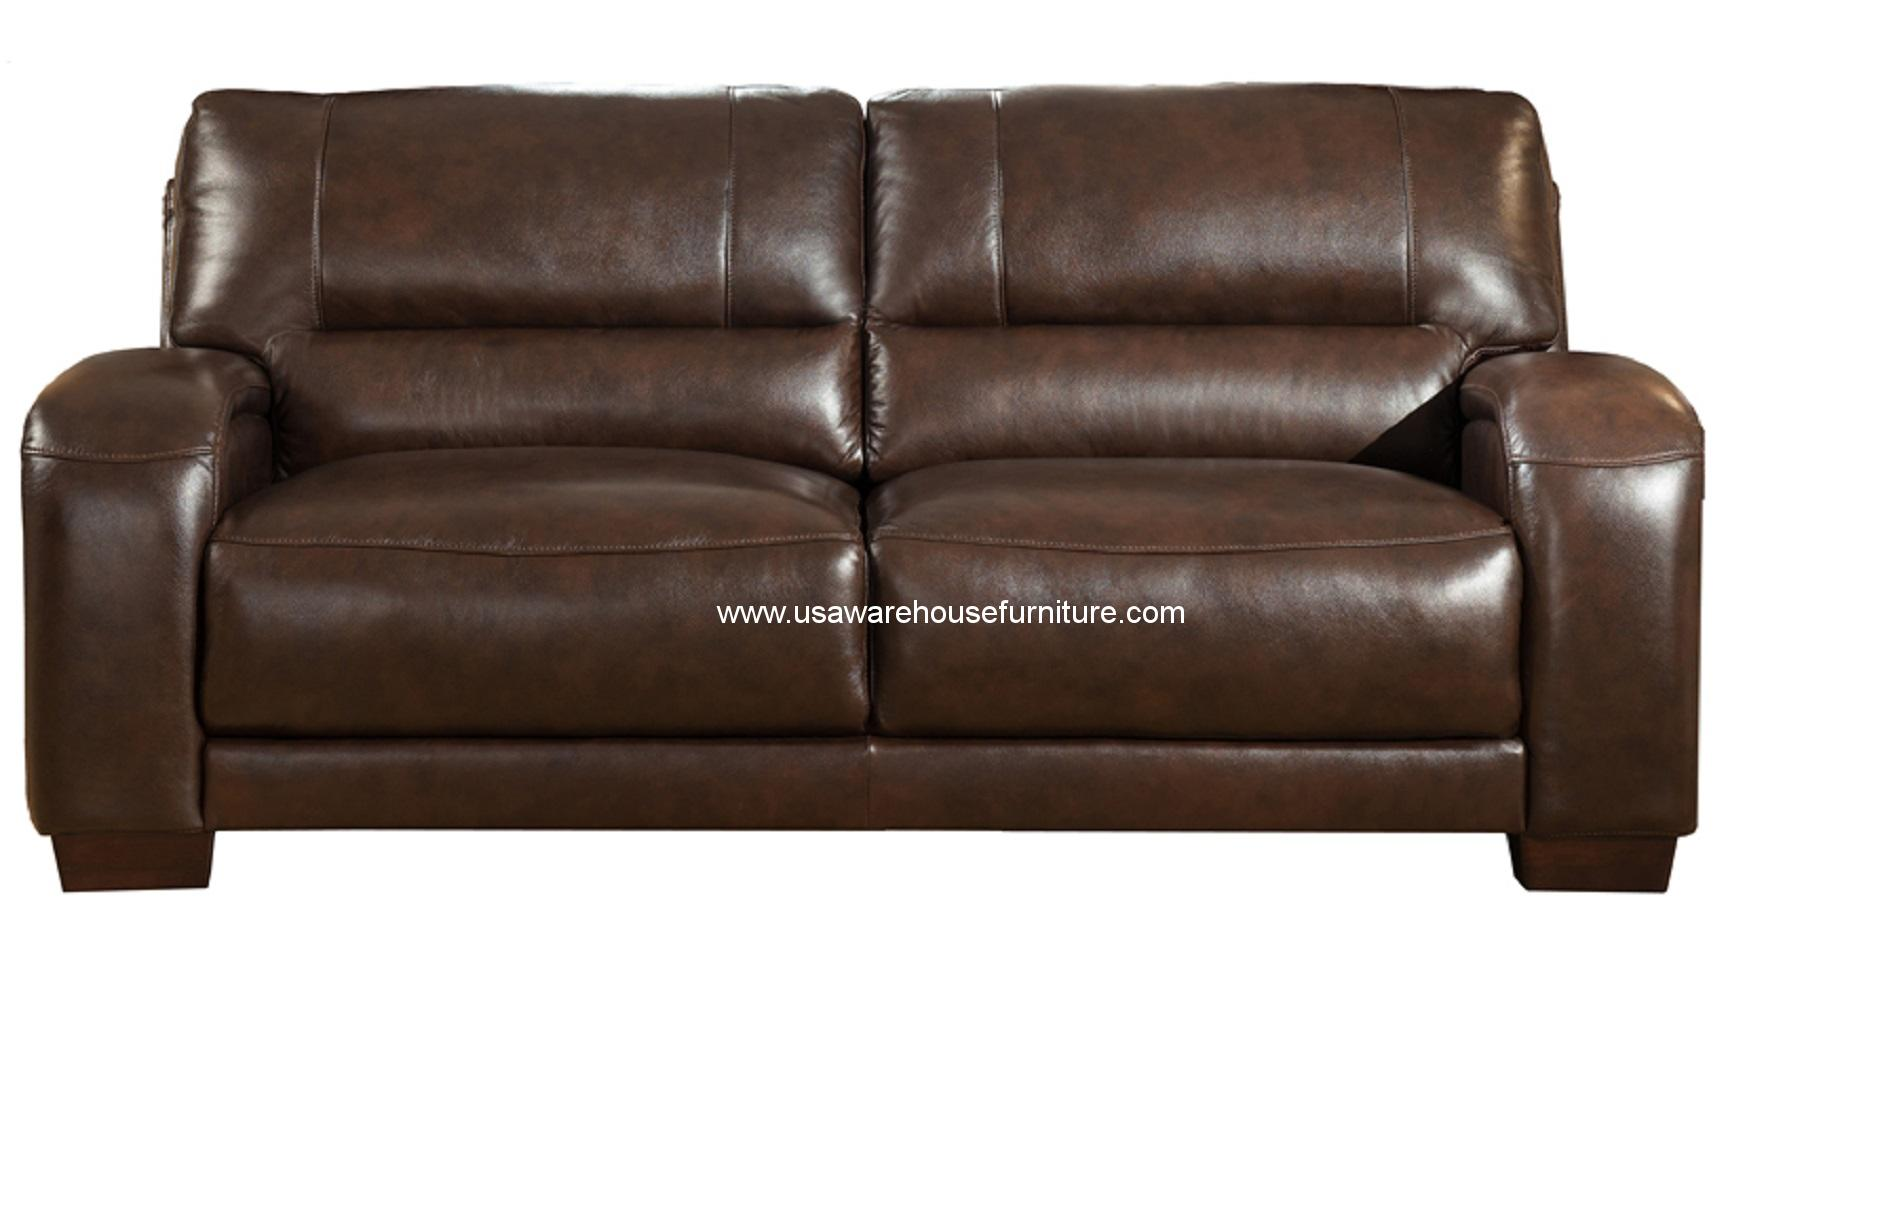 brigitte dark brown full top grain leather sofa usa warehouse furniture. Black Bedroom Furniture Sets. Home Design Ideas